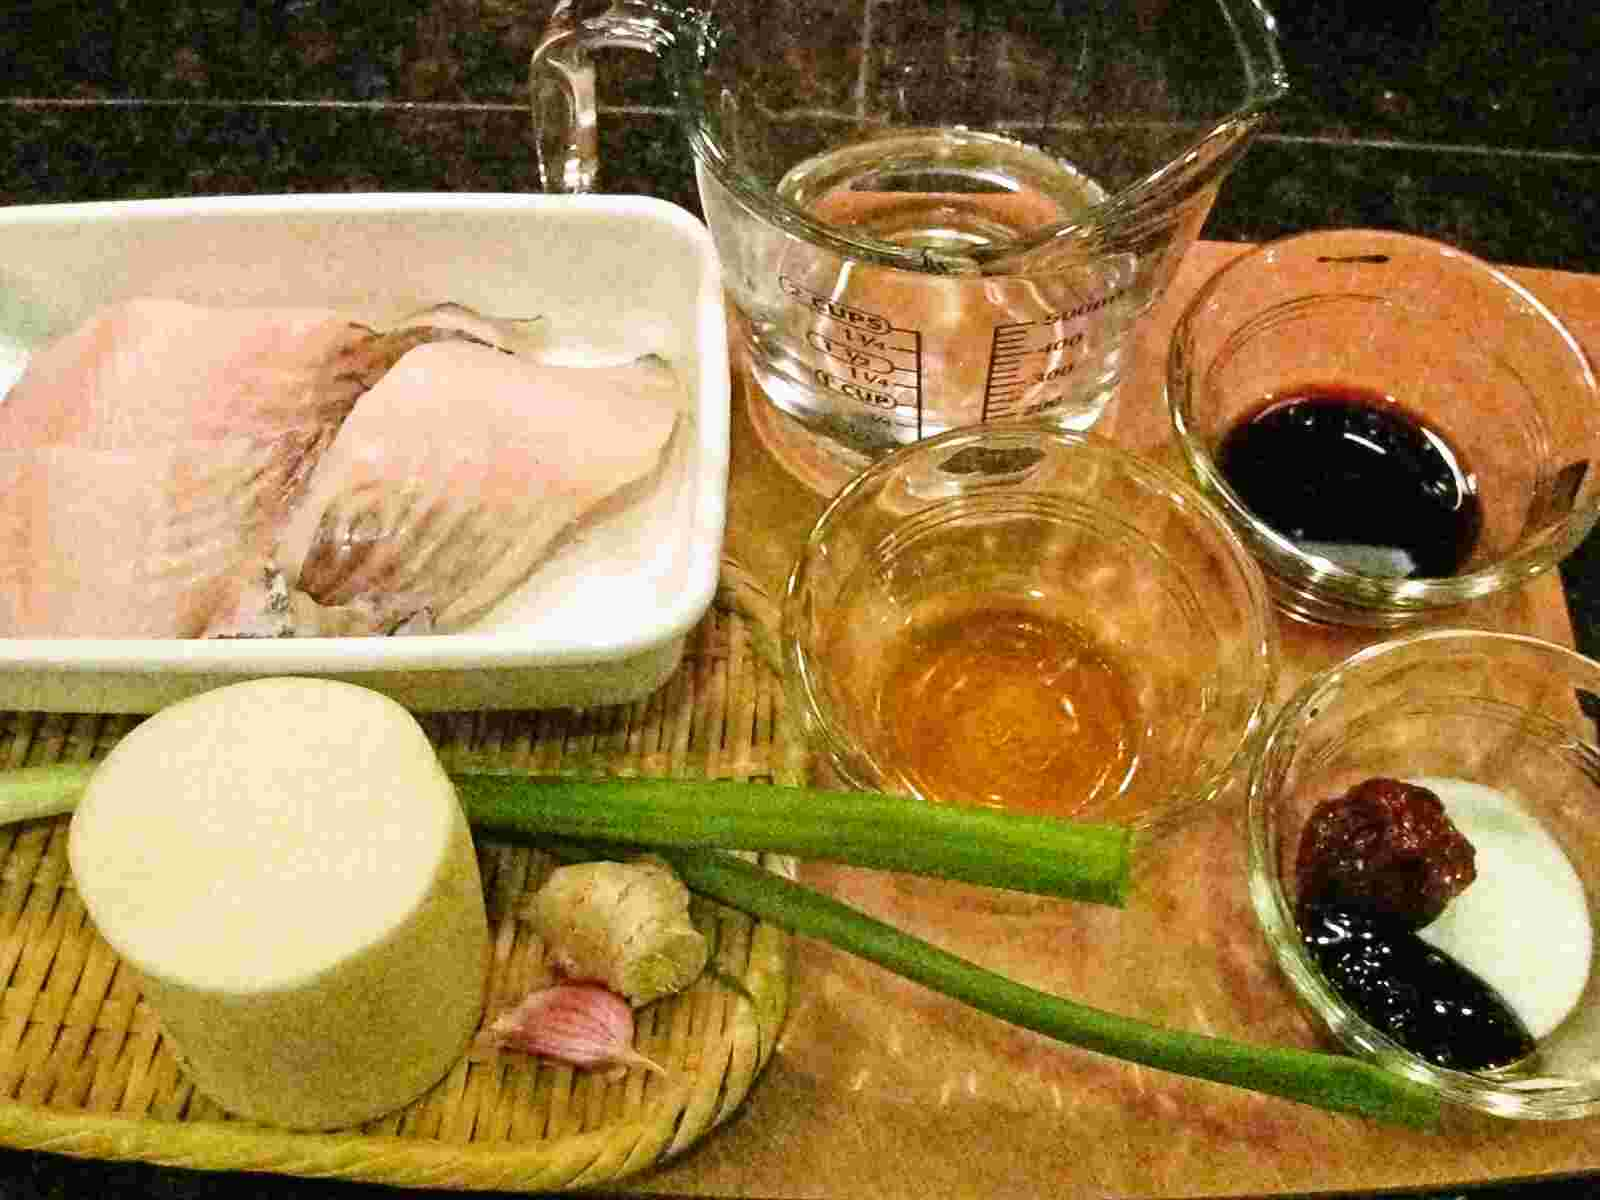 Recipes for Tom Gindara to daikon no pirikarani black